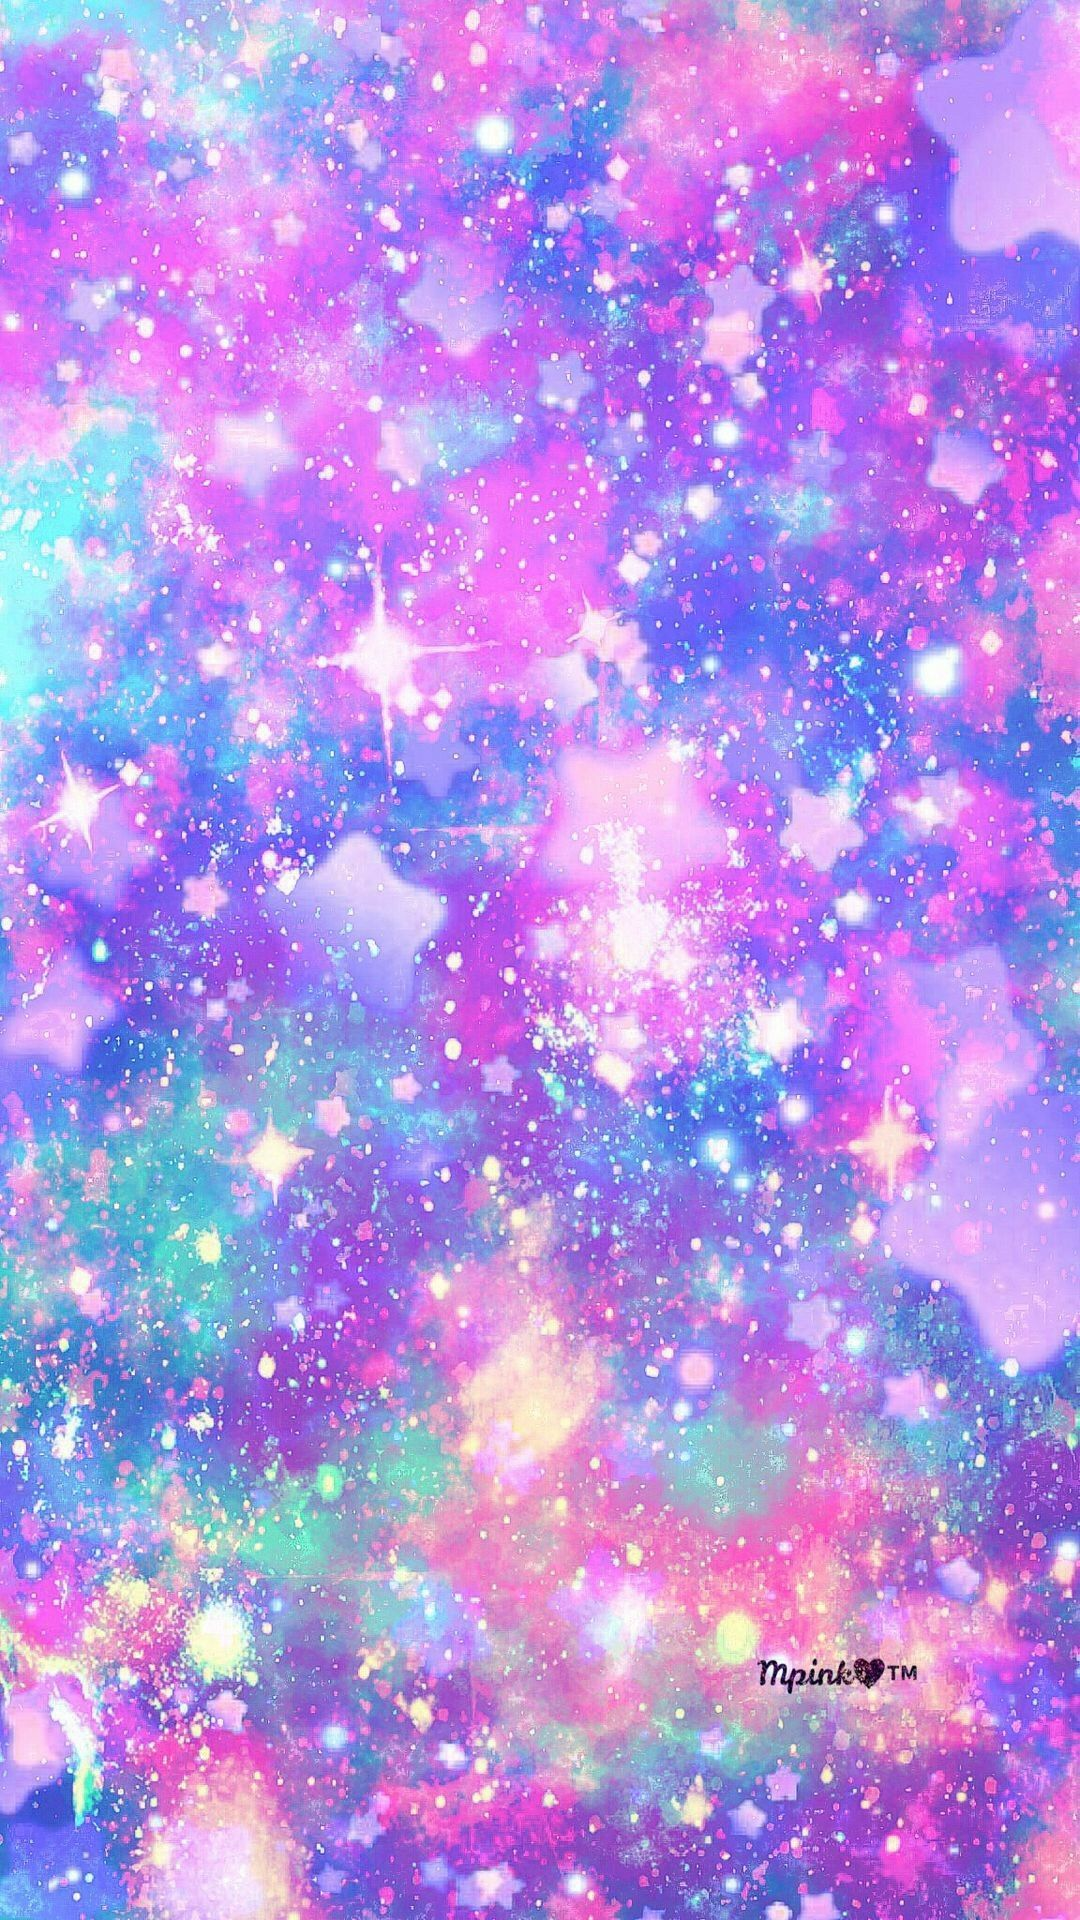 Pastel Galaxy Stars Galaxy Wallpaper Iphone Unicorn Wallpaper Unicorn Wallpaper Cute